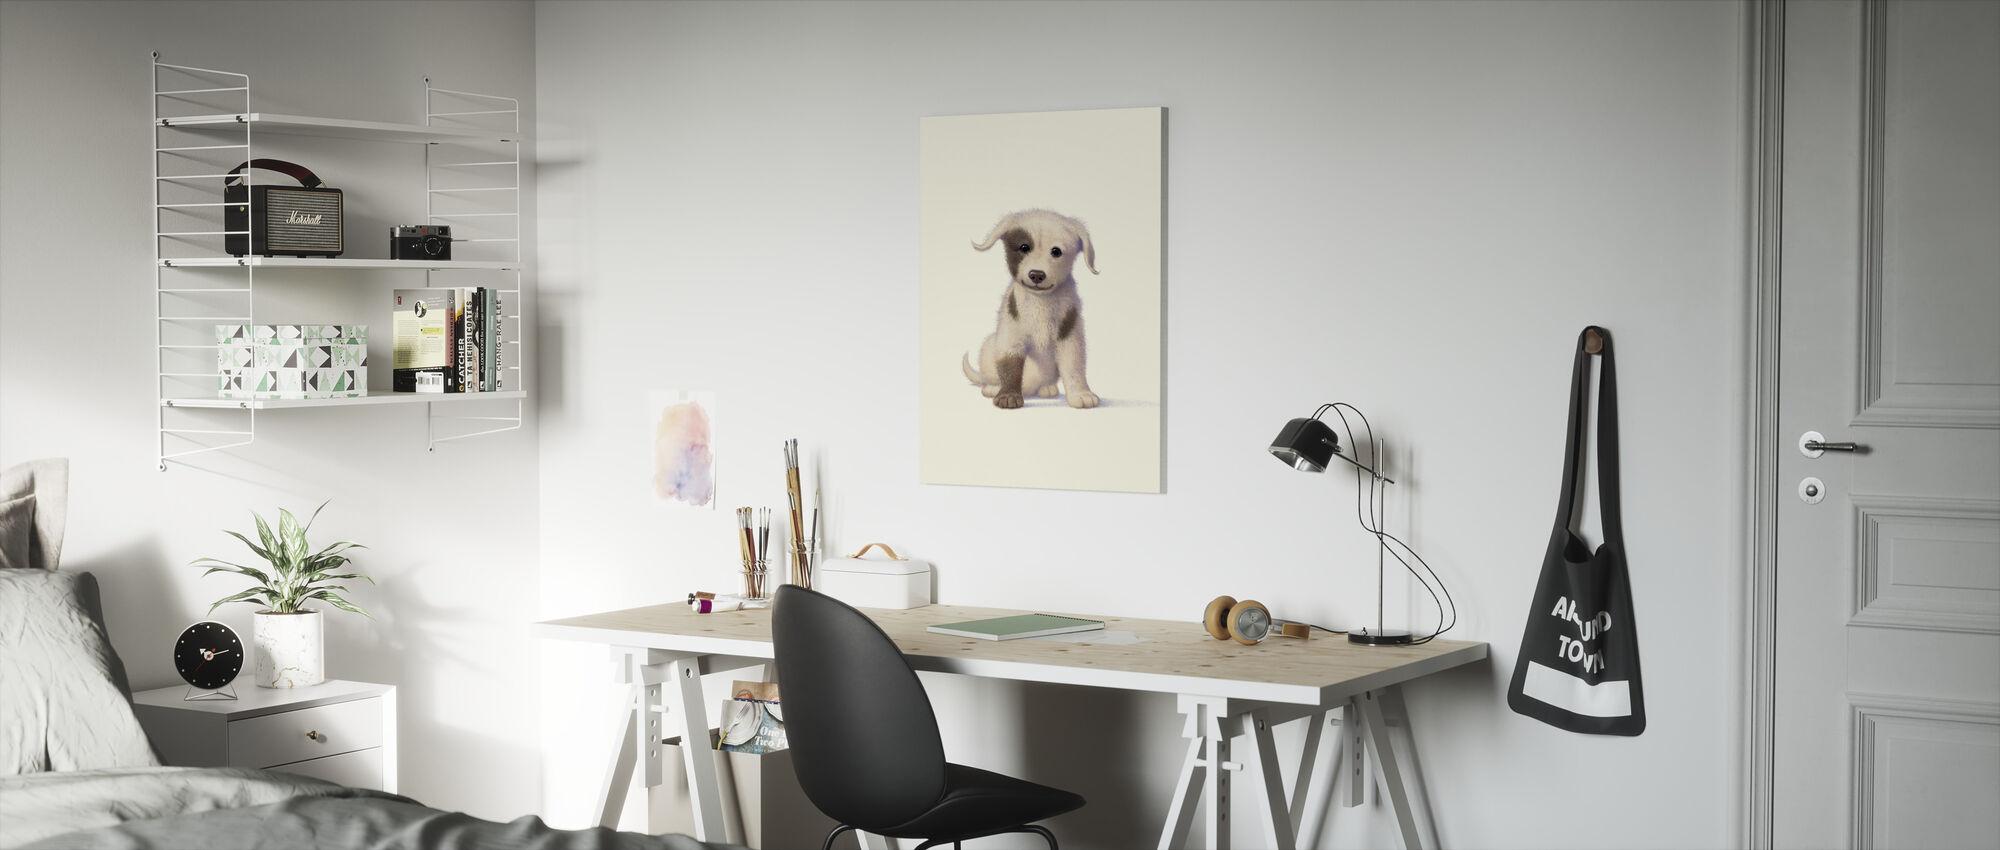 Koiranpentu - Canvastaulu - Lastenhuone